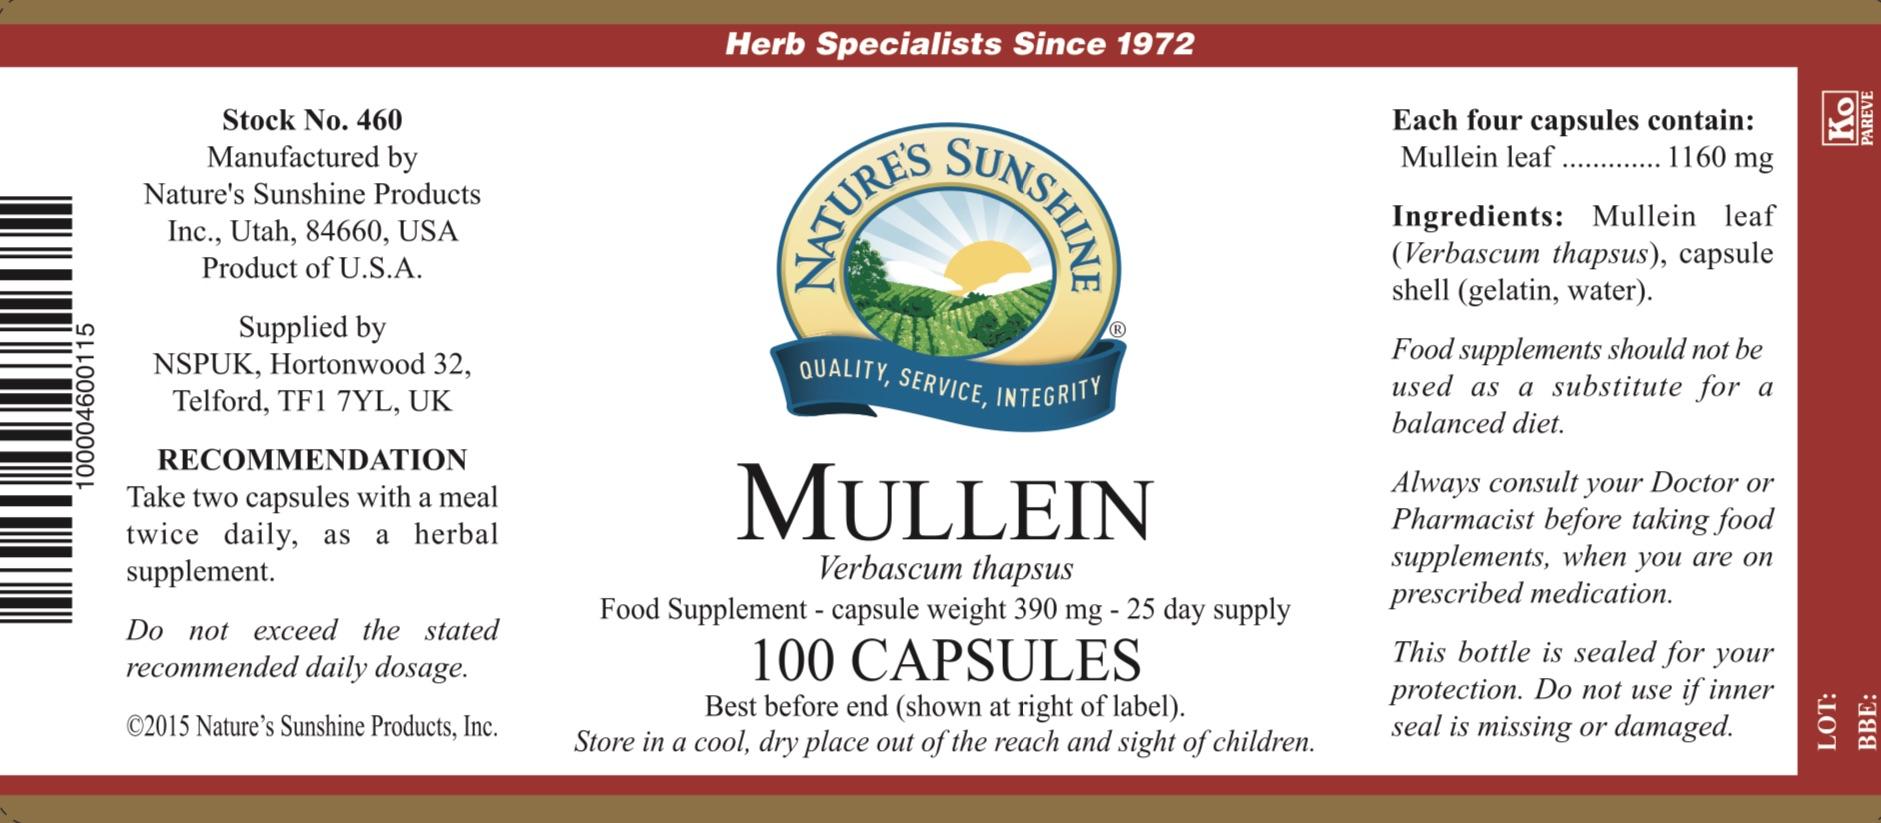 Nature's Sunshine - Mullein - Label